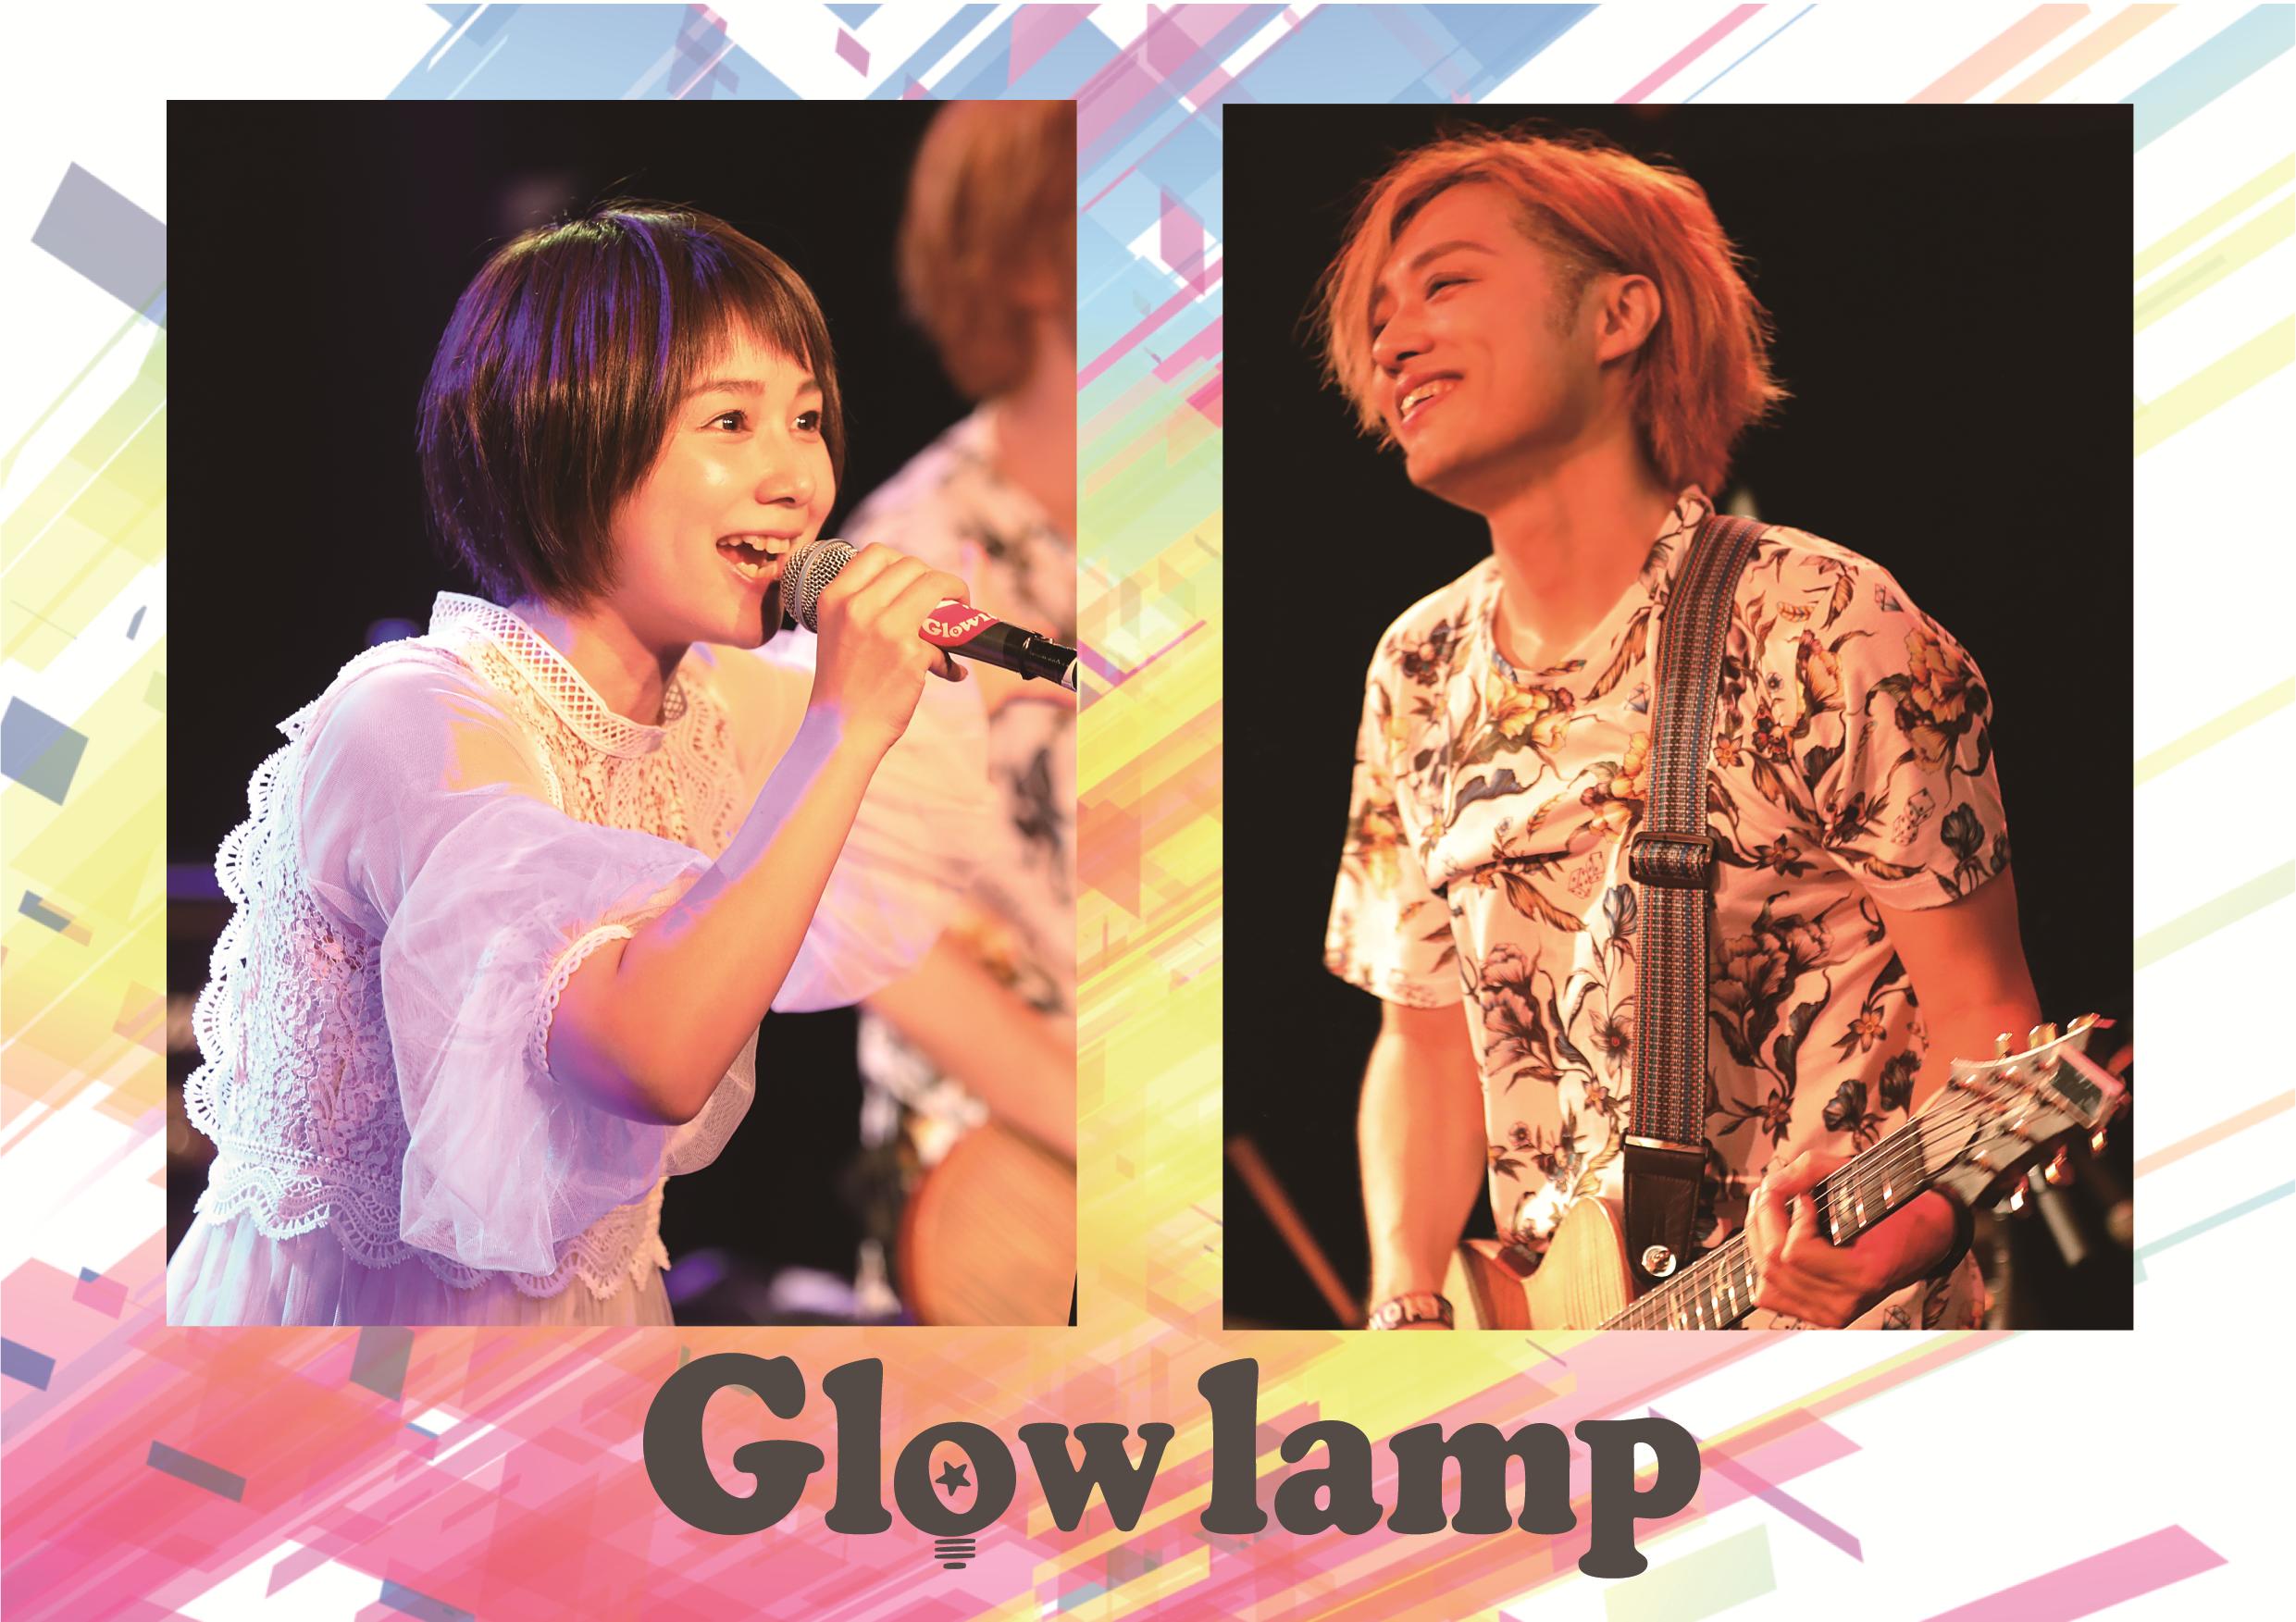 Glowlamp